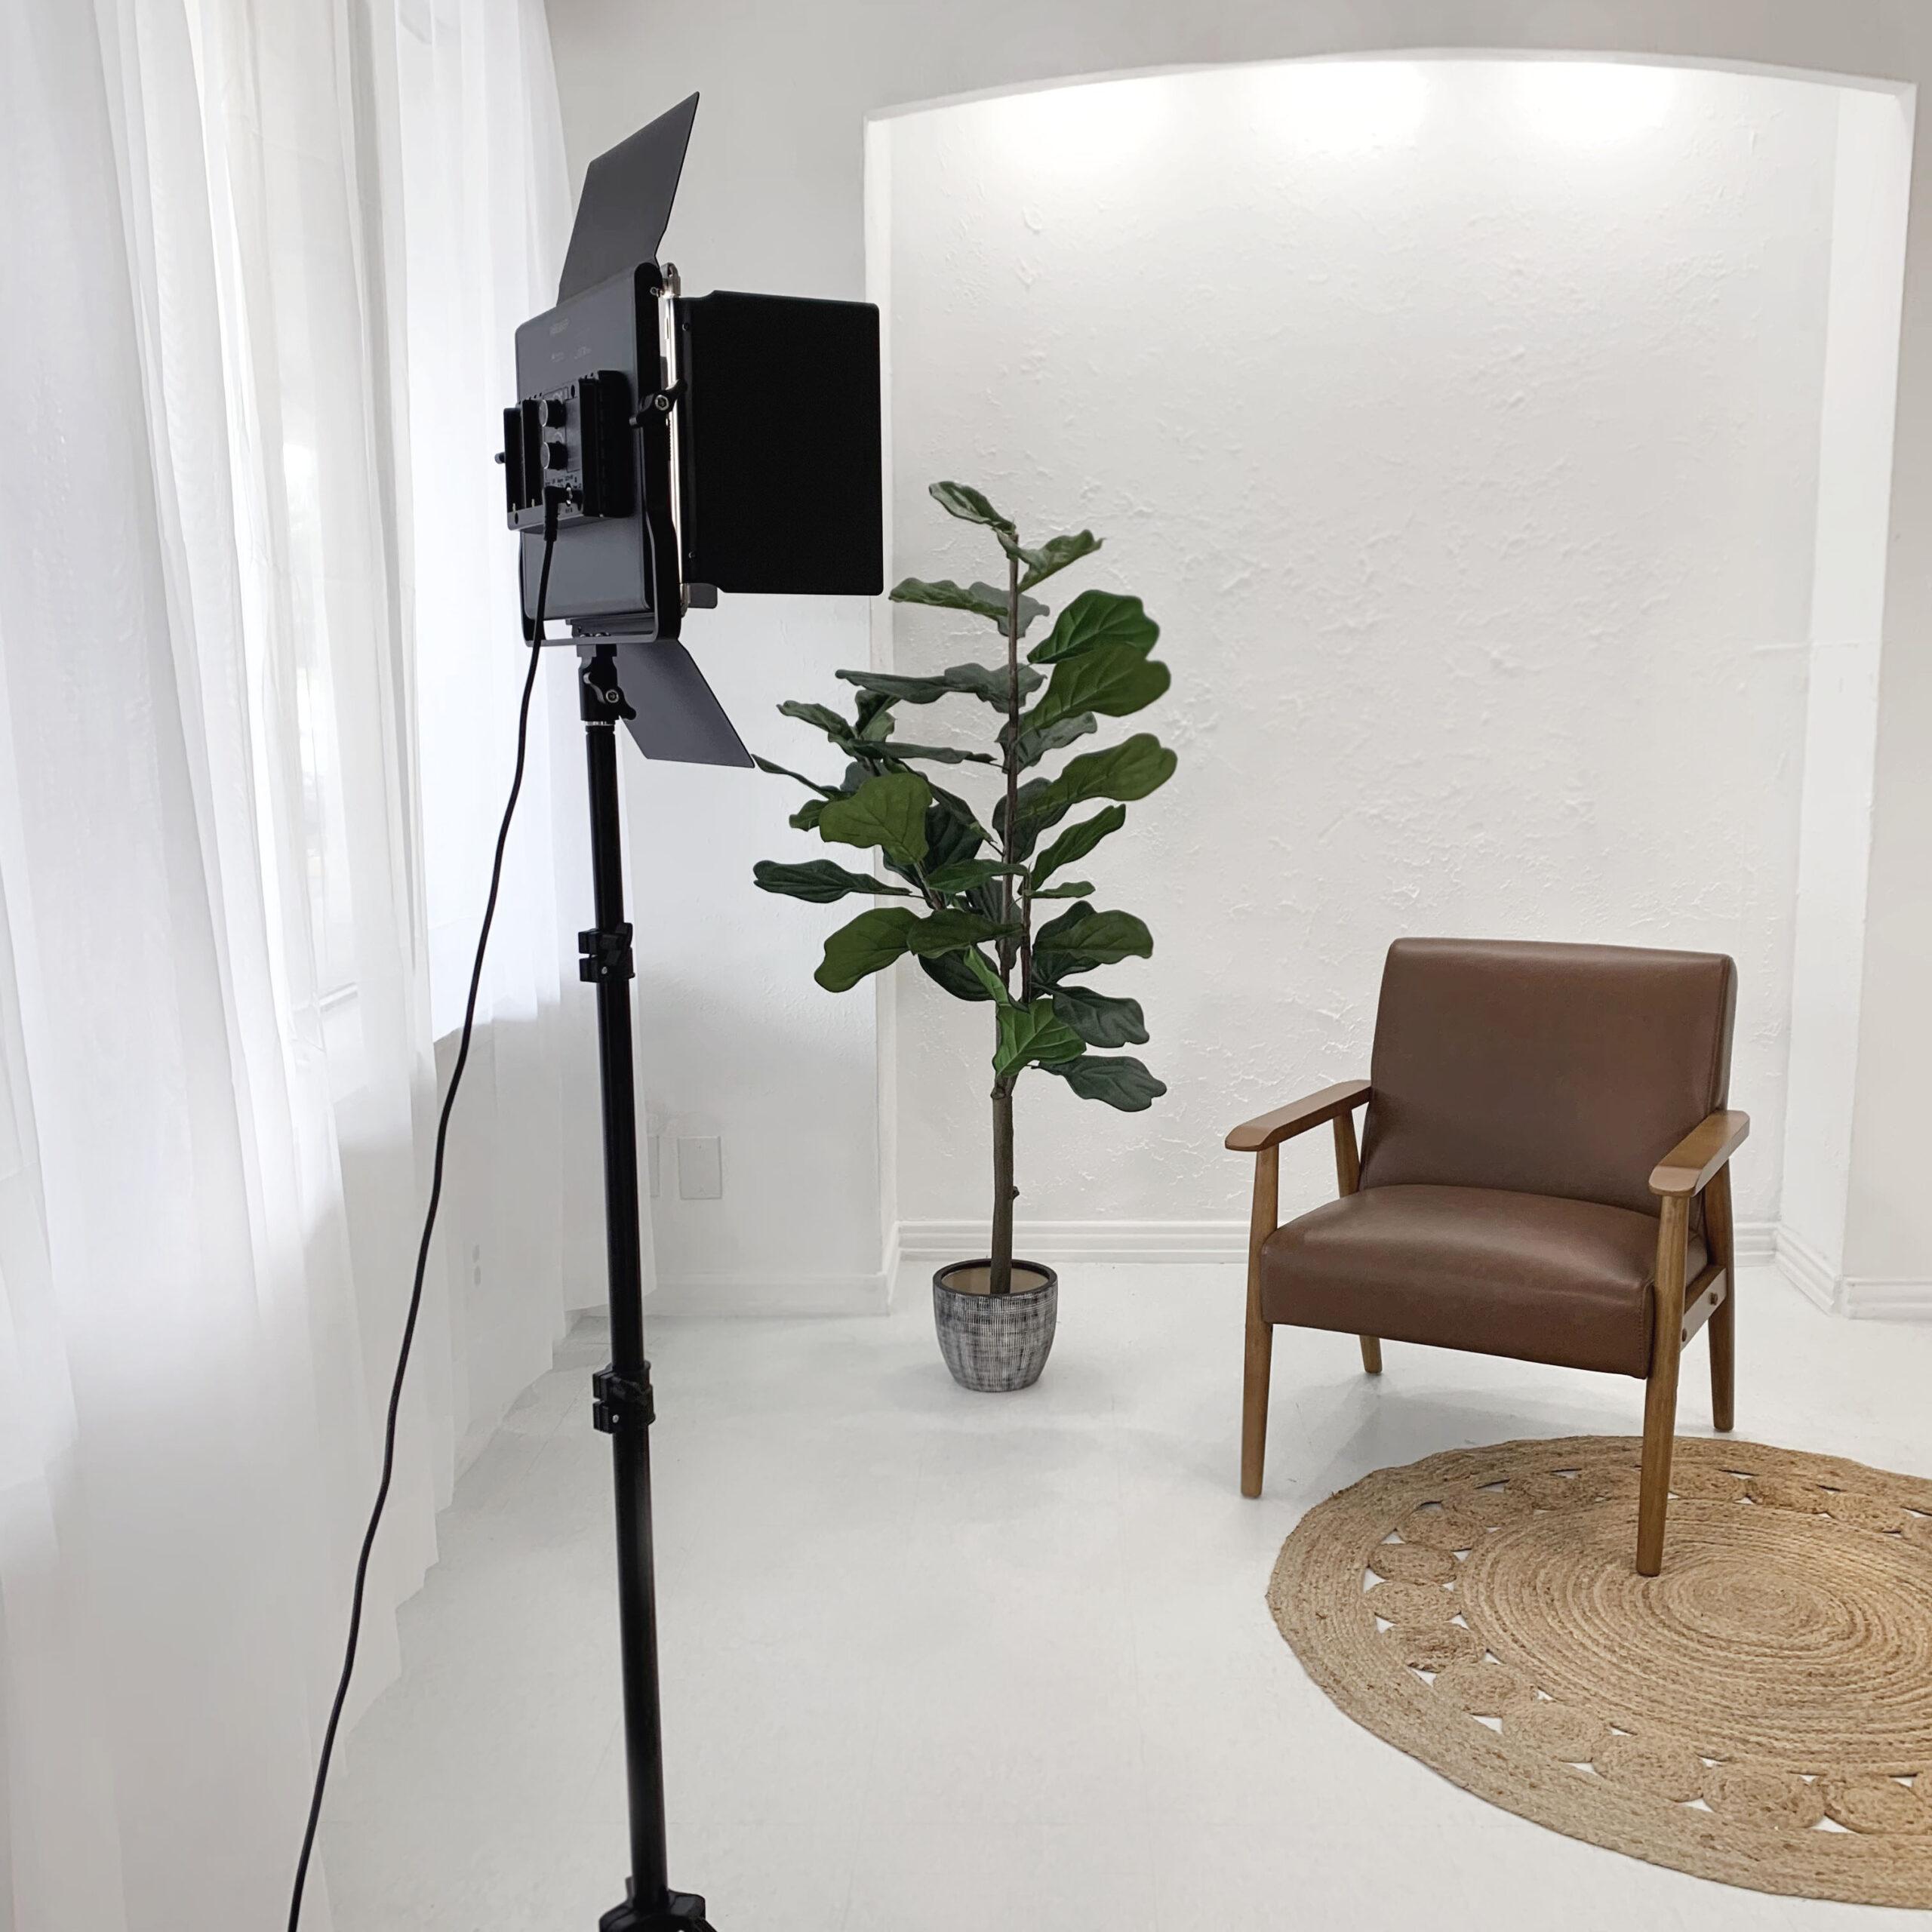 Brown Chair & Plant at Sun Catcher Studio